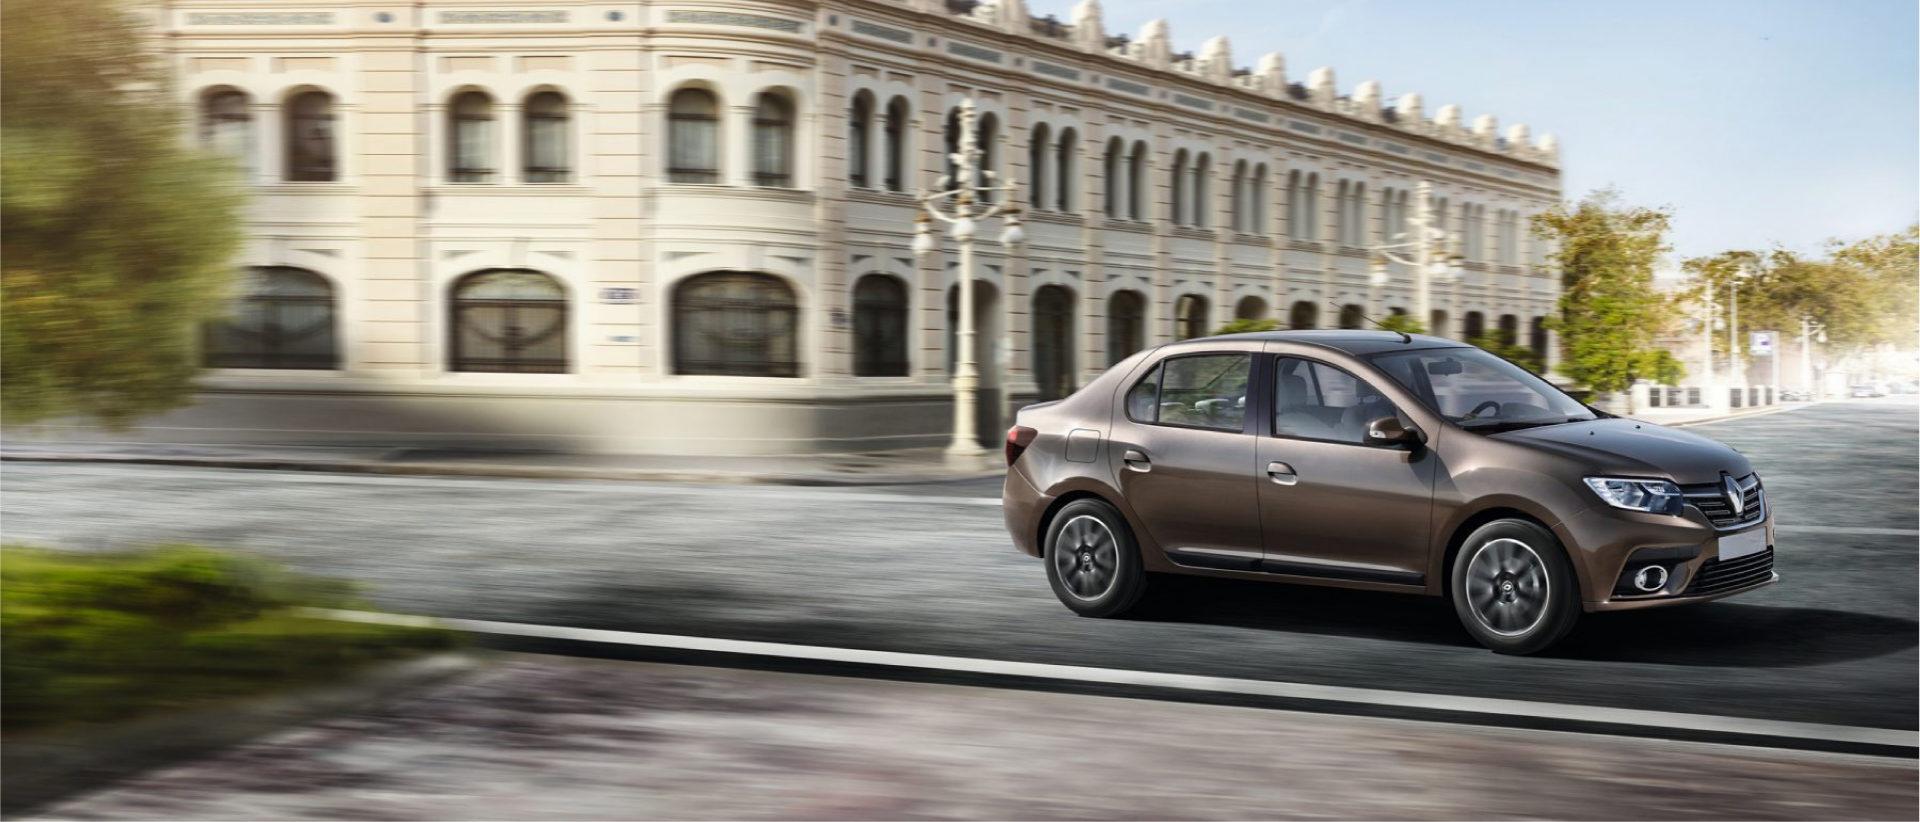 Renault LOGAN (салон) фото 4